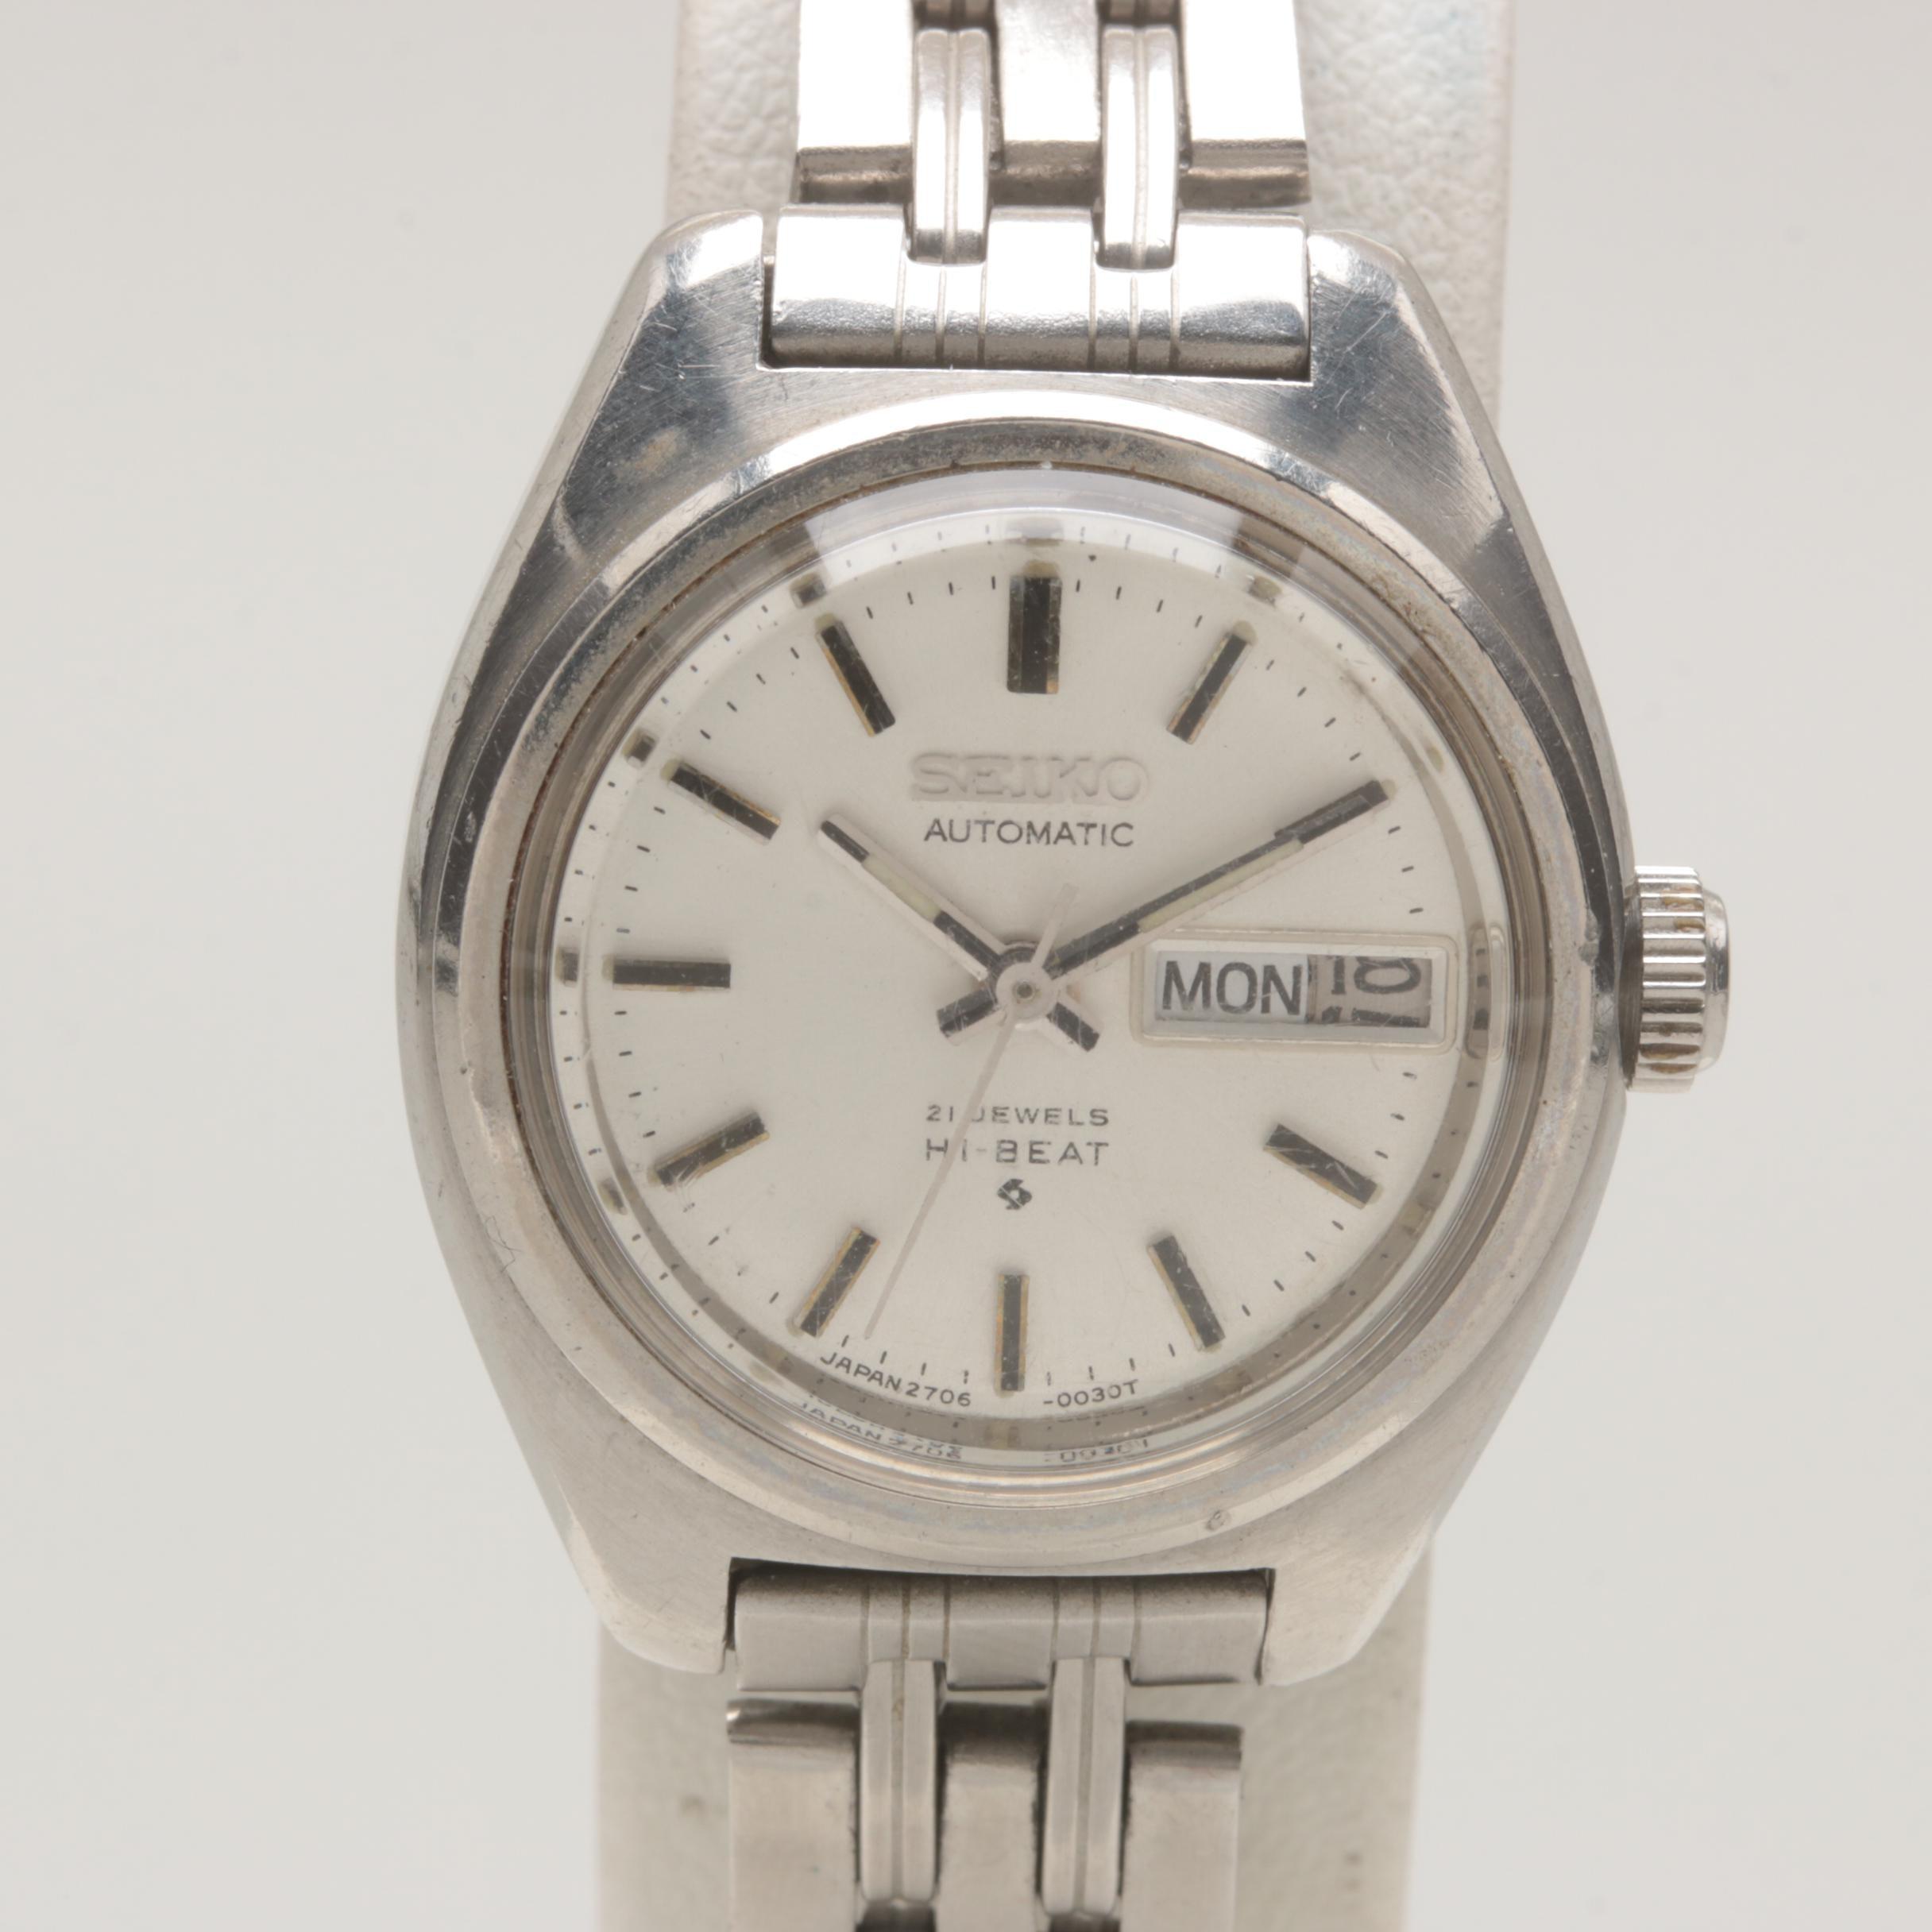 Seiko Stainless Steel Automatic Wristwatch